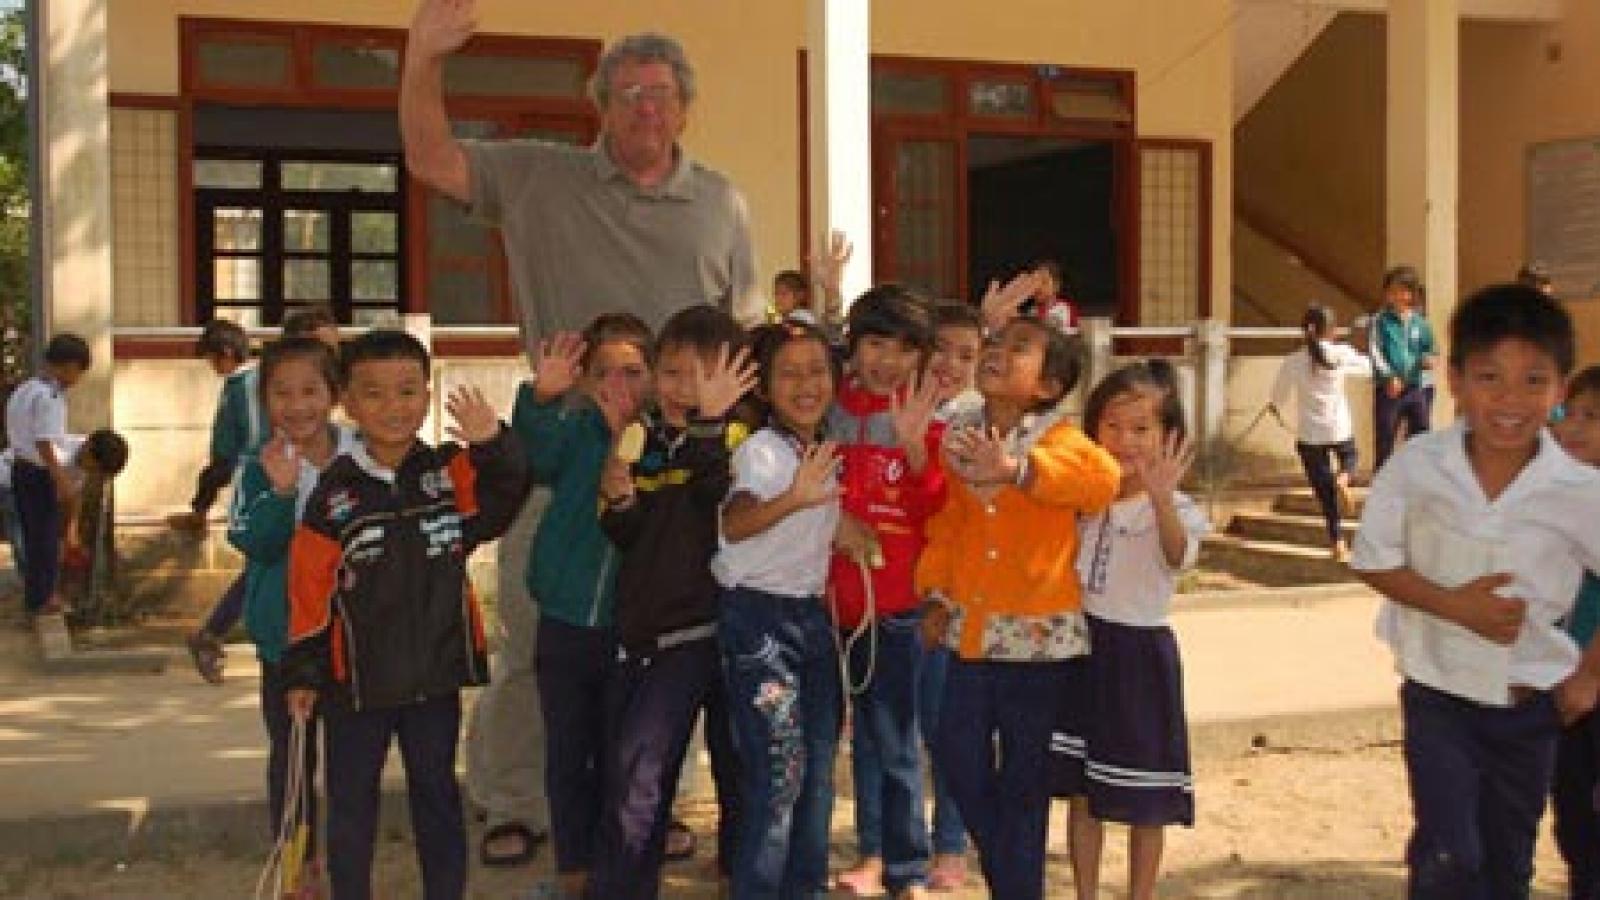 American war veteran works to alleviate poverty in Vietnam